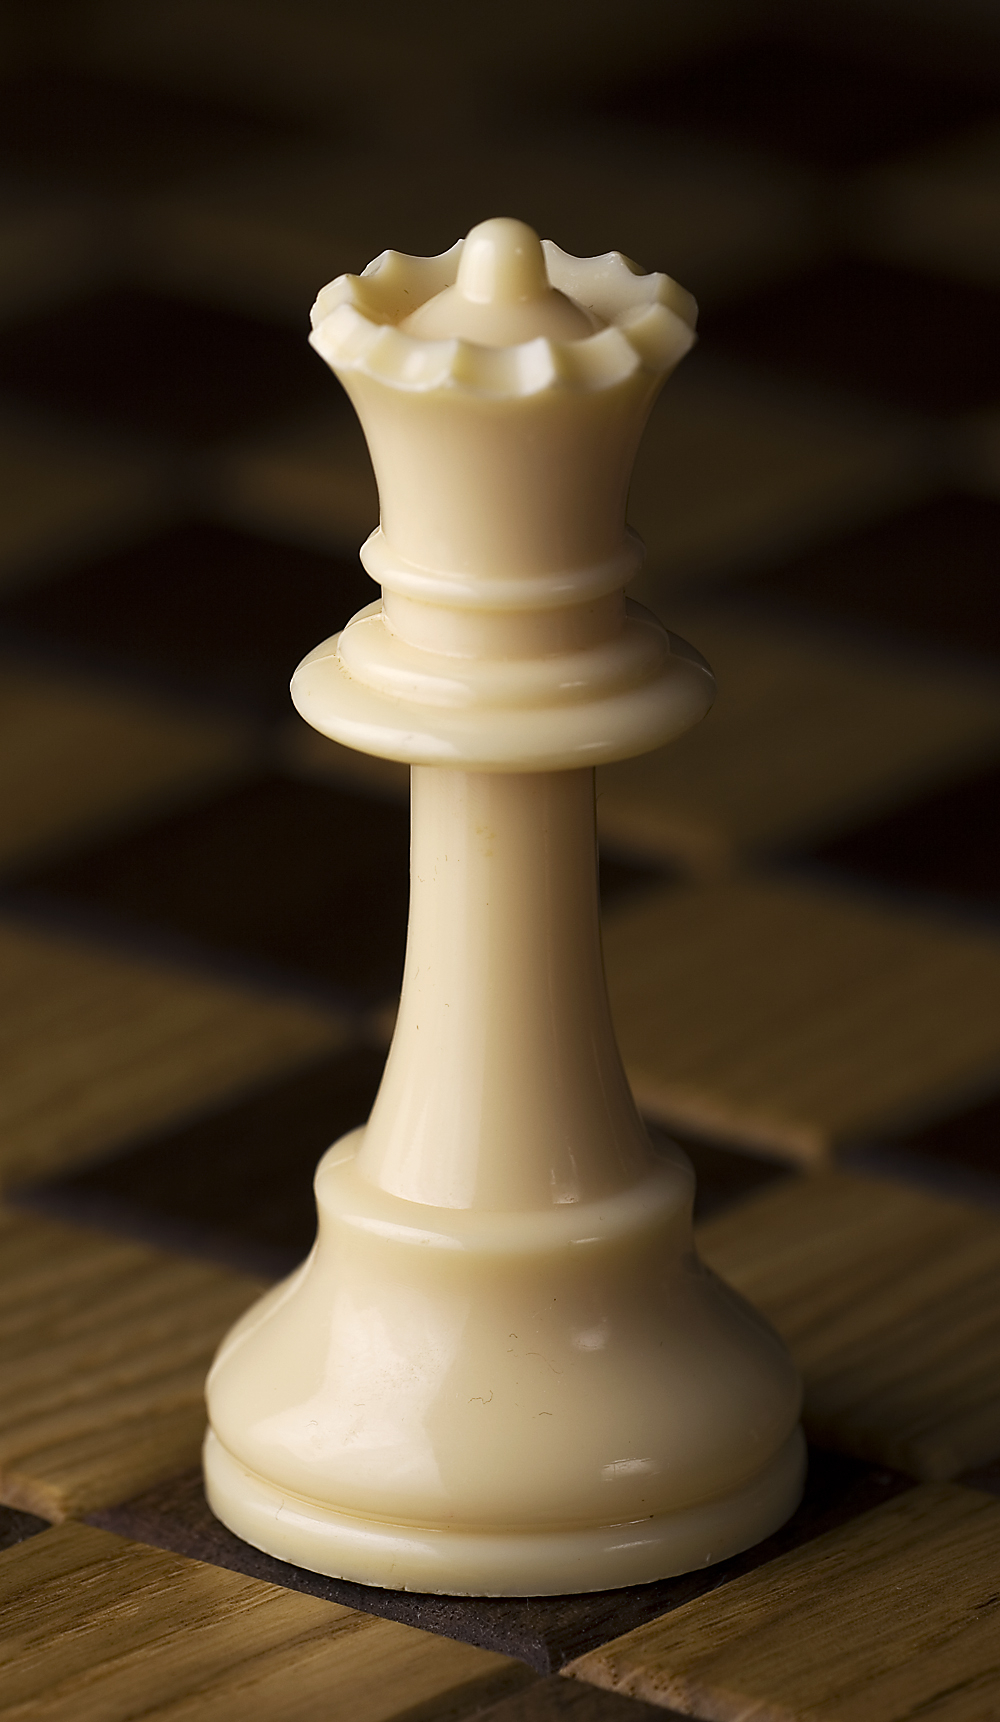 1000x1722 Queen Chess Piece Drawing Queen (Chess)